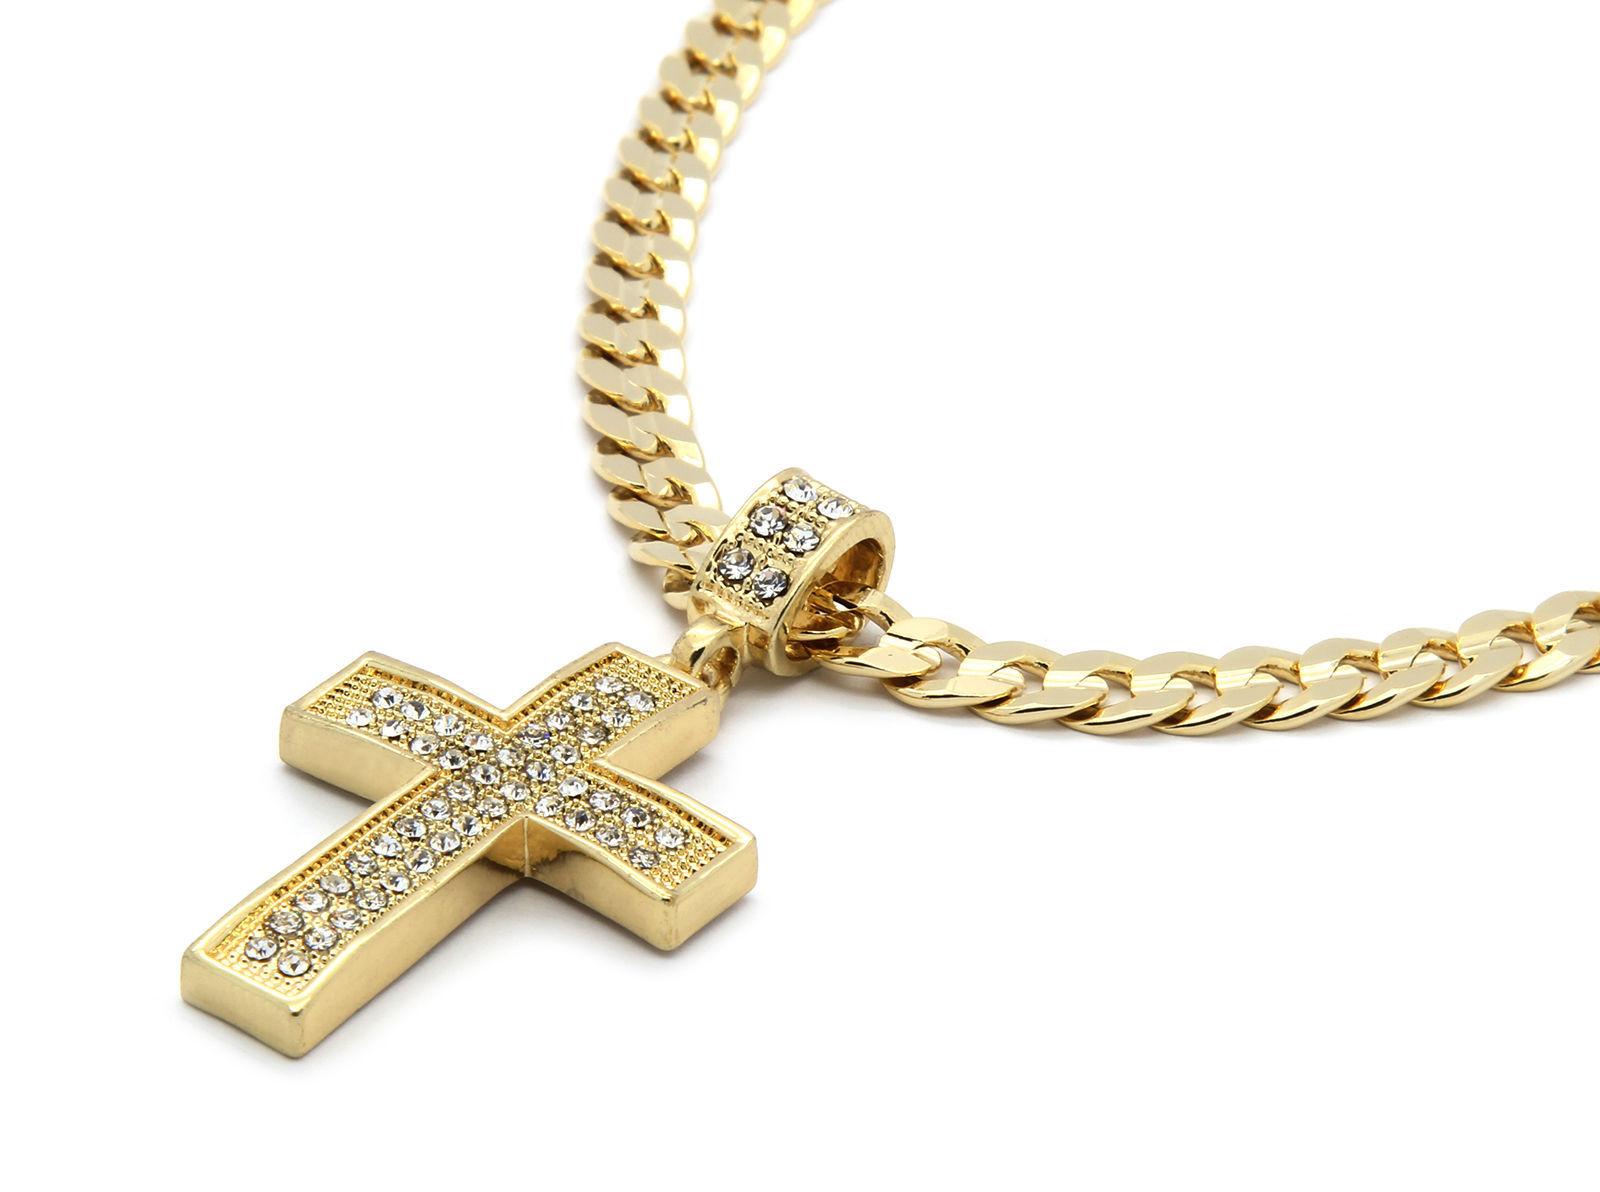 "Mens 14k Gold Plated Cz G4-Dome Cross Pendant Hip-Hop 24"" Cuban Necklace Chain"